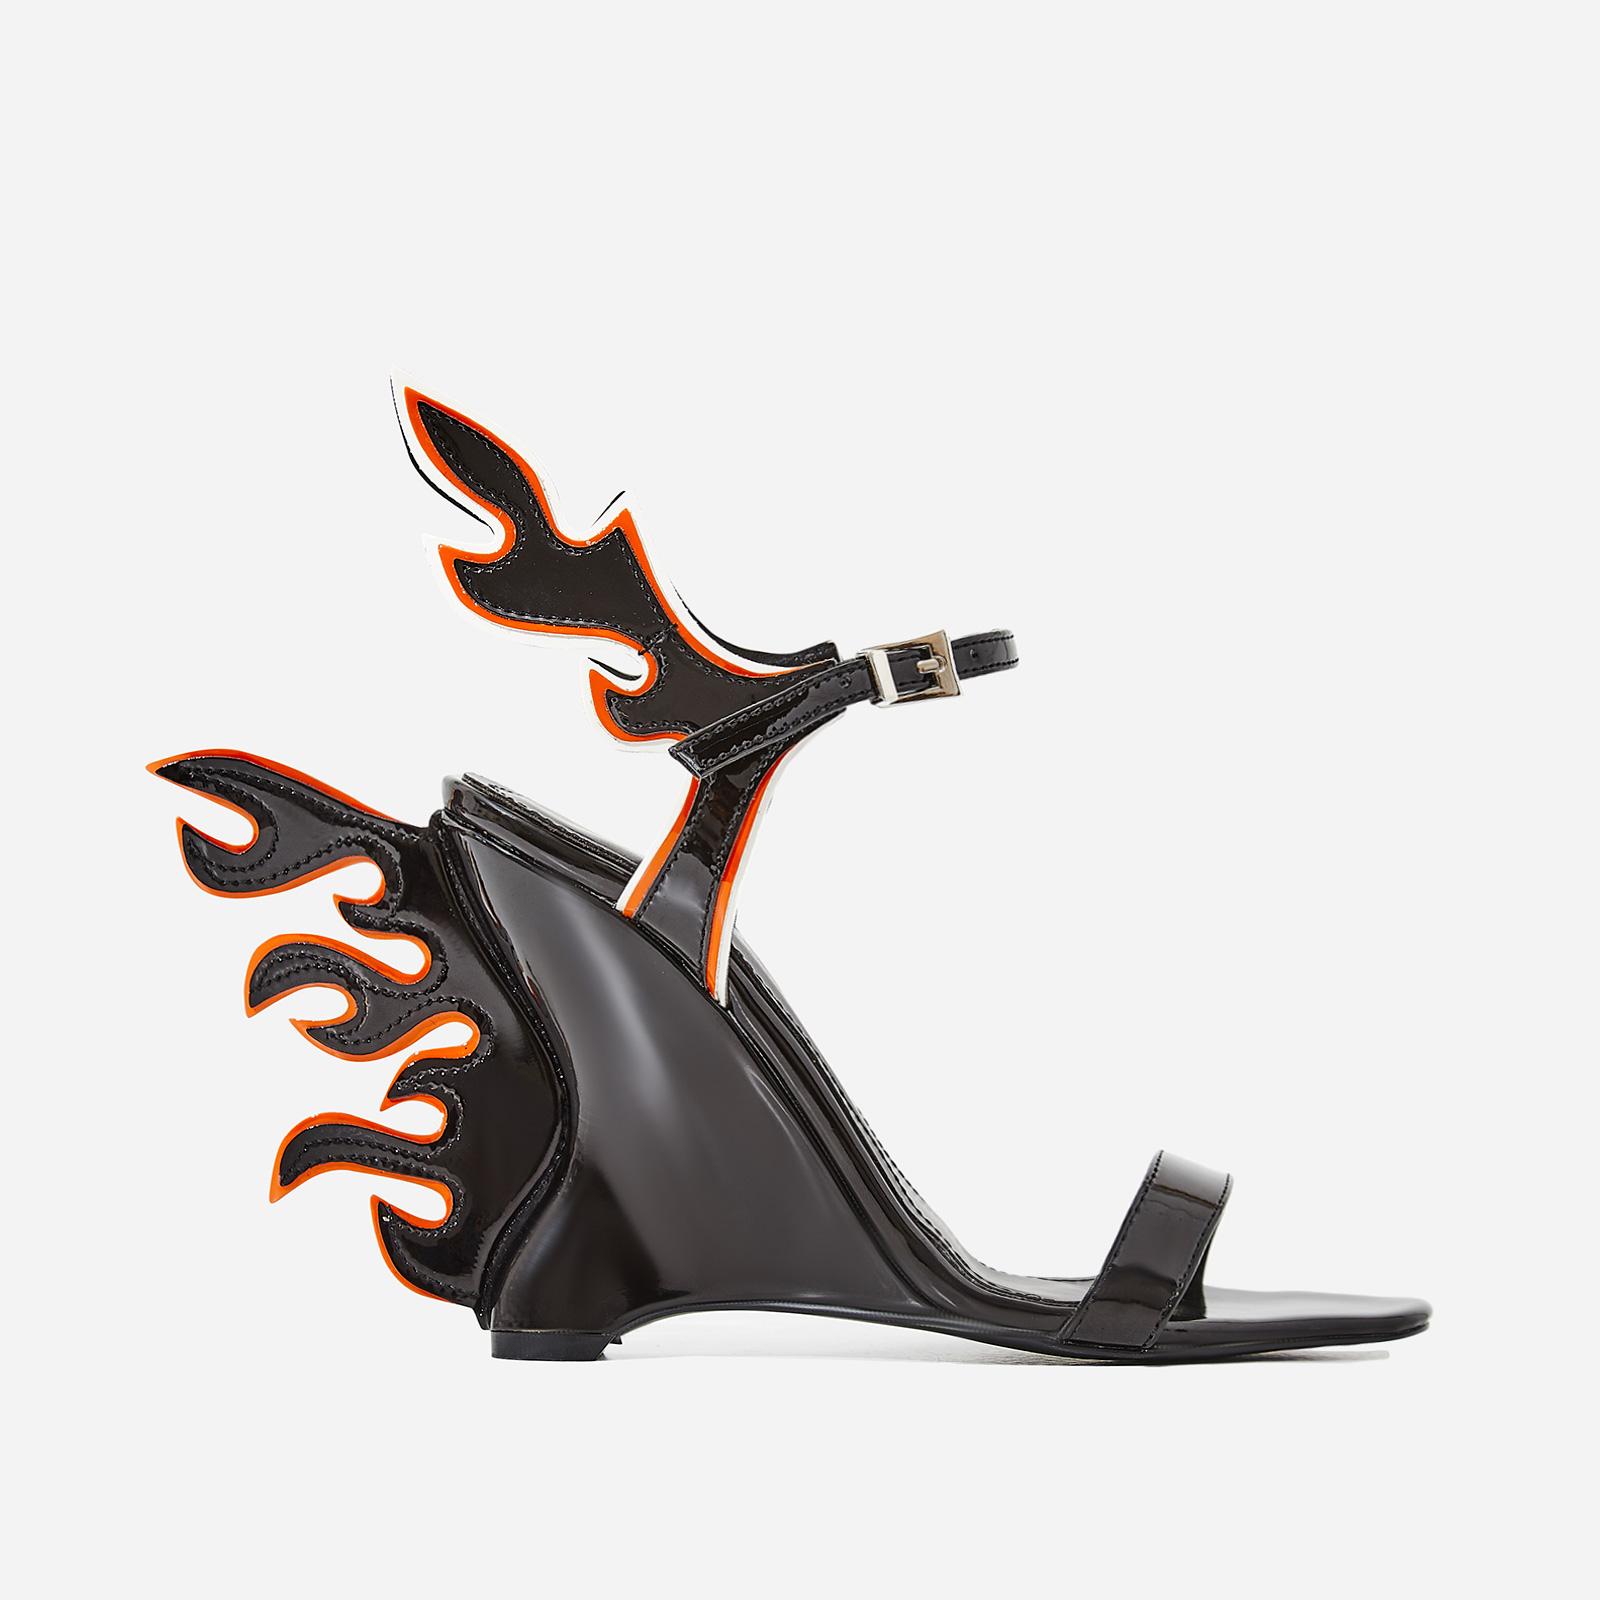 Flame Wedge Heel In Black Patent